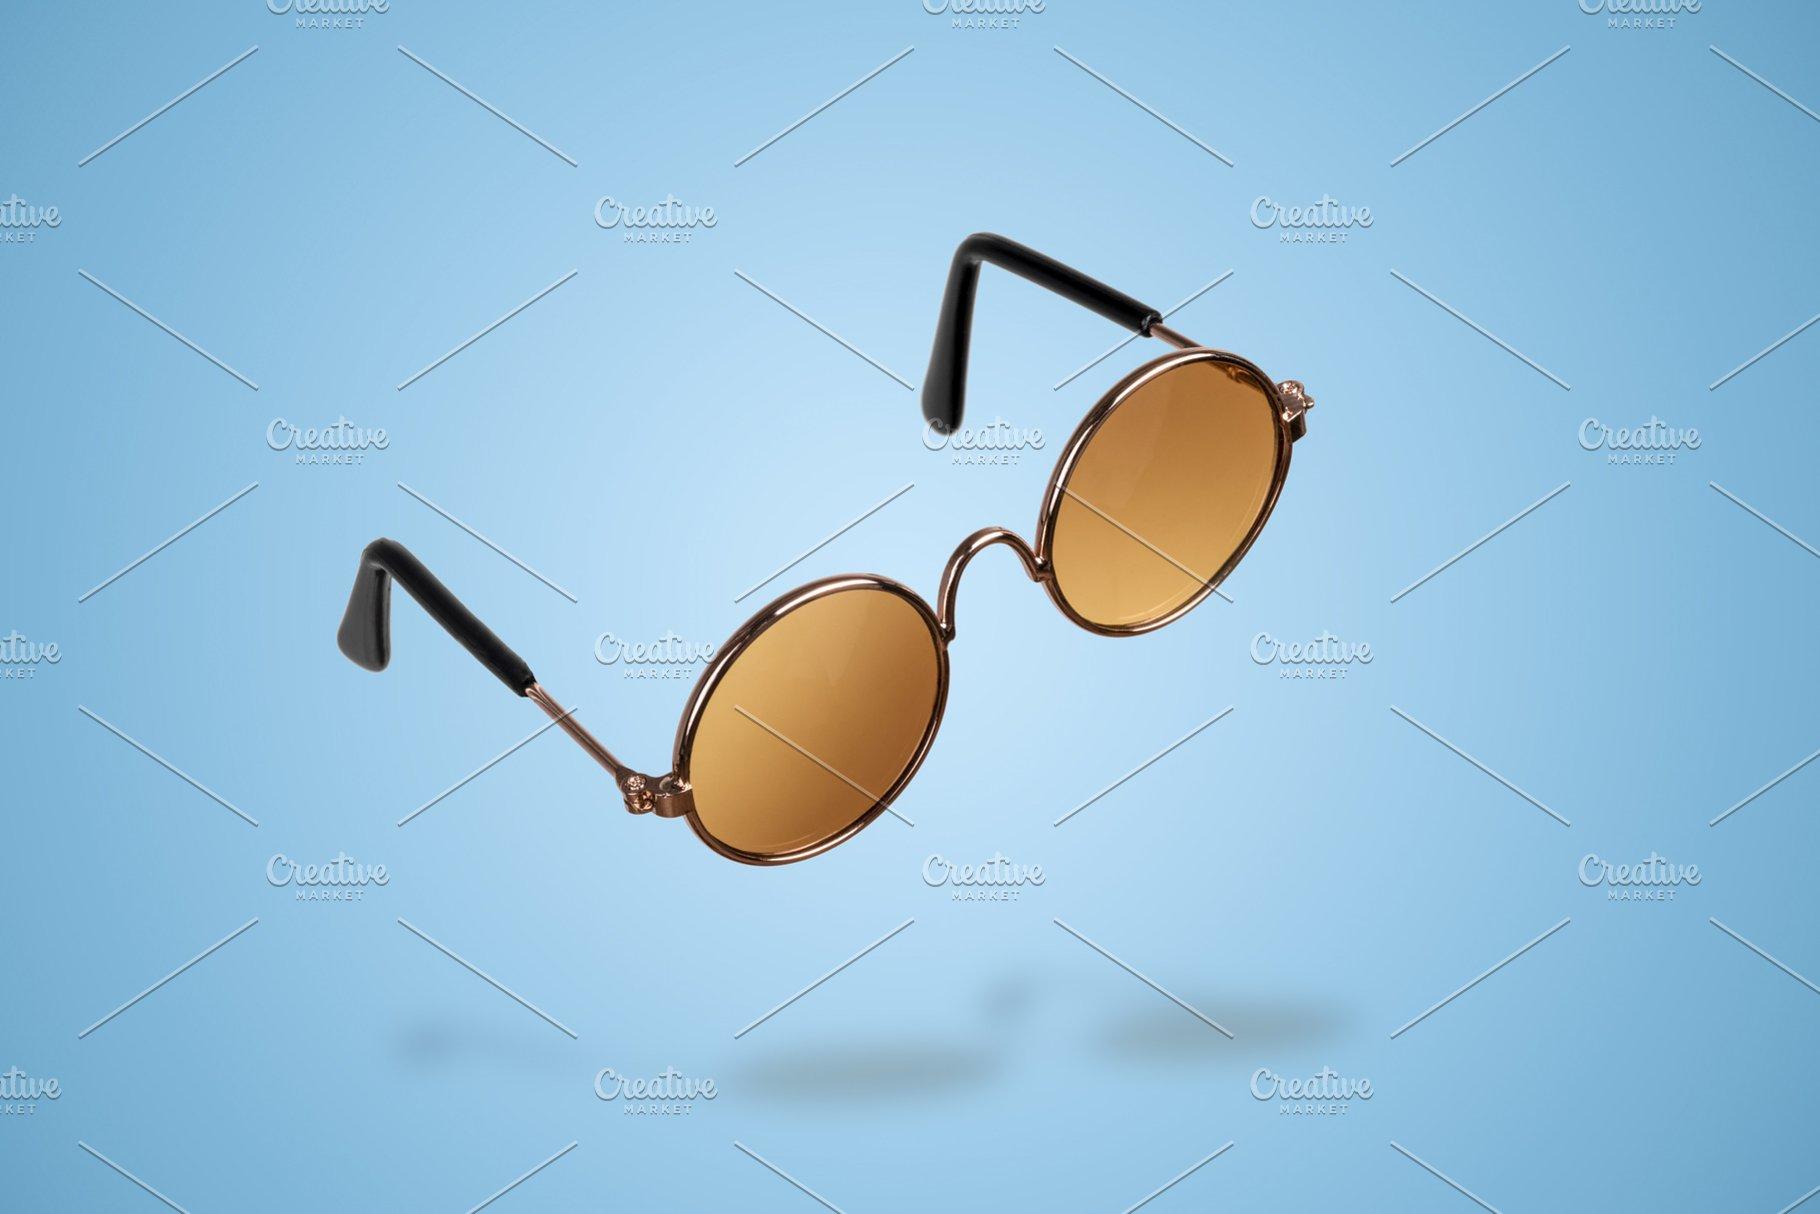 d817447550d0 levitating sunglasses ~ Holiday Photos ~ Creative Market